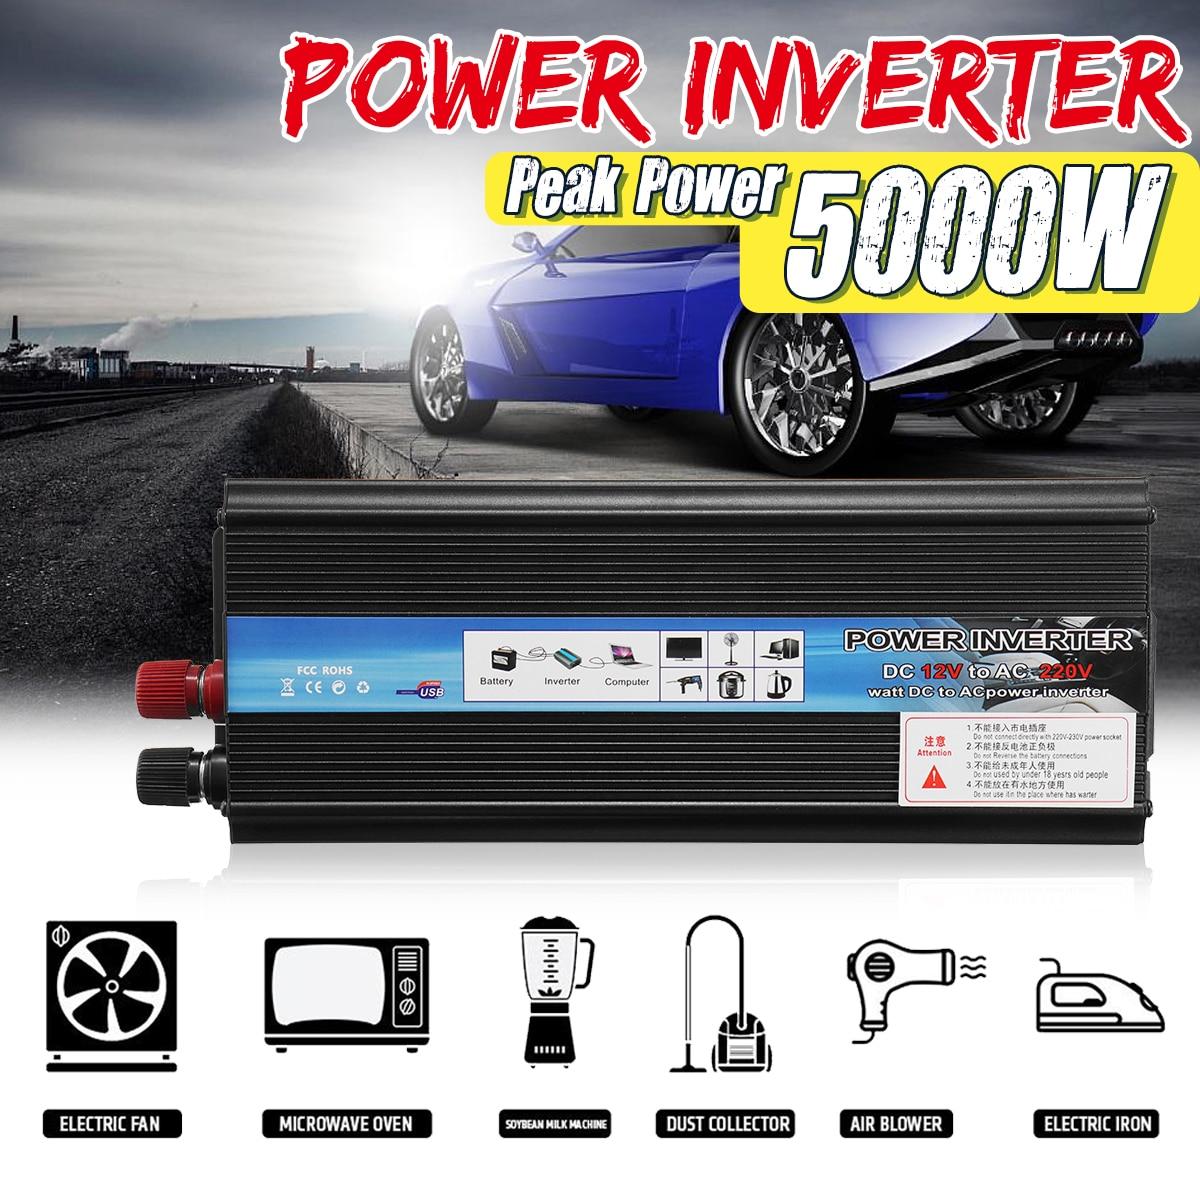 PeakCar-محول جهد السيارة ، محول طاقة السيارة 5000 واط ، محول جهد تيار مستمر 12 فولت/24 فولت إلى تيار متردد 220 فولت ، موجة جيبية معدلة